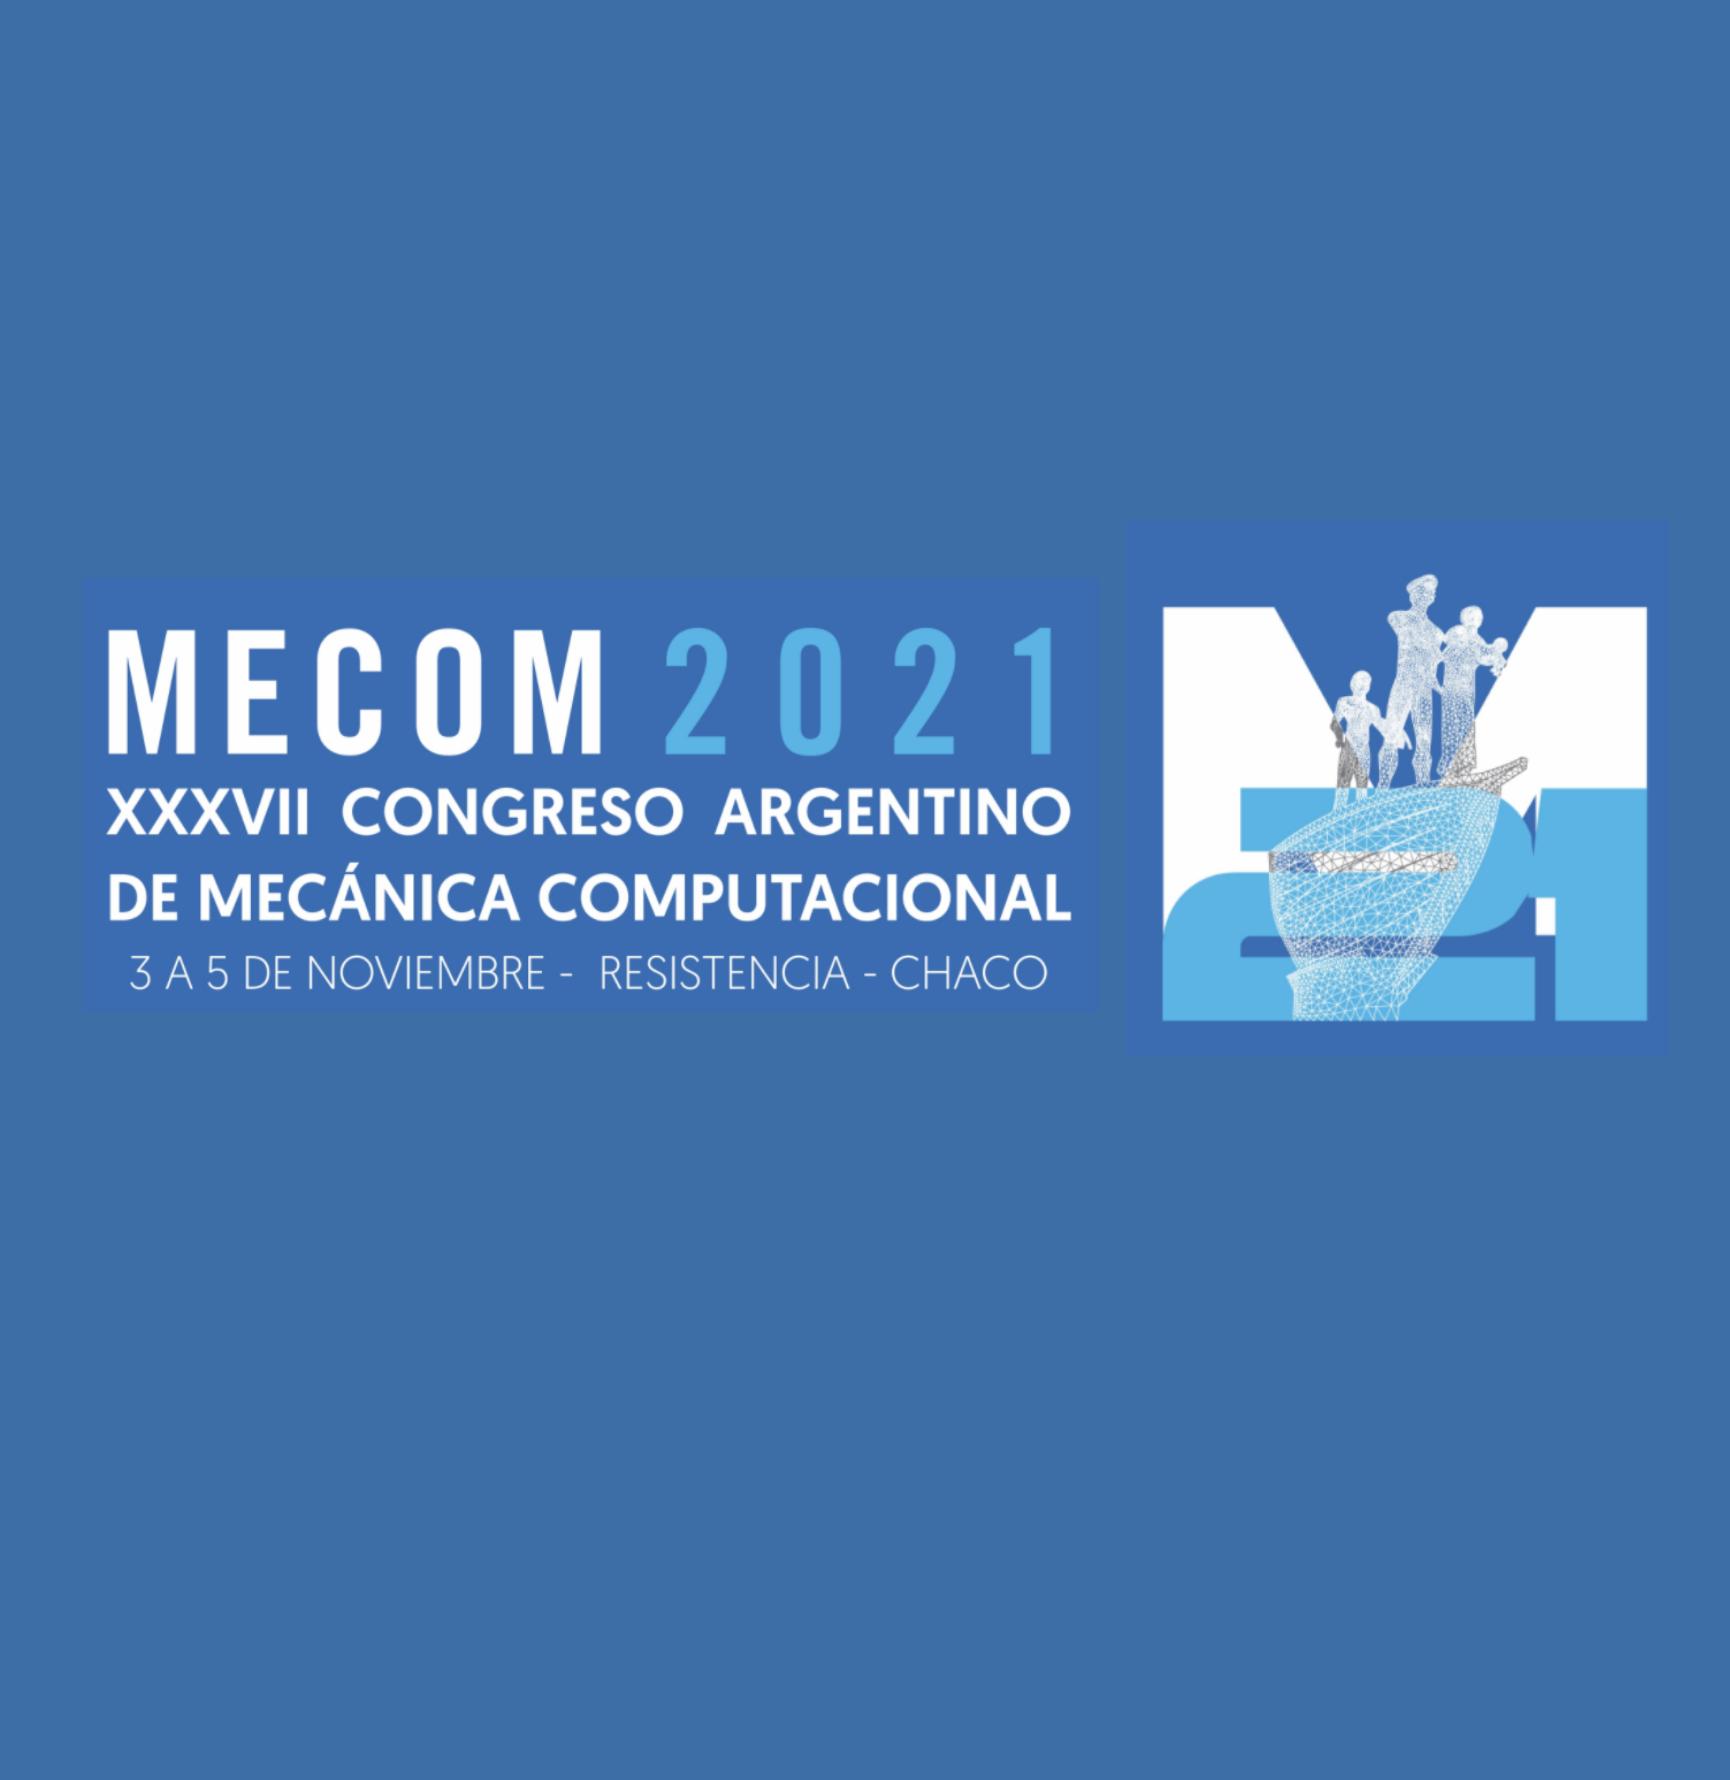 XXXVII CONGRESO ARGENTINO DE MECÁNICA COMPUTACIONAL | SAIG